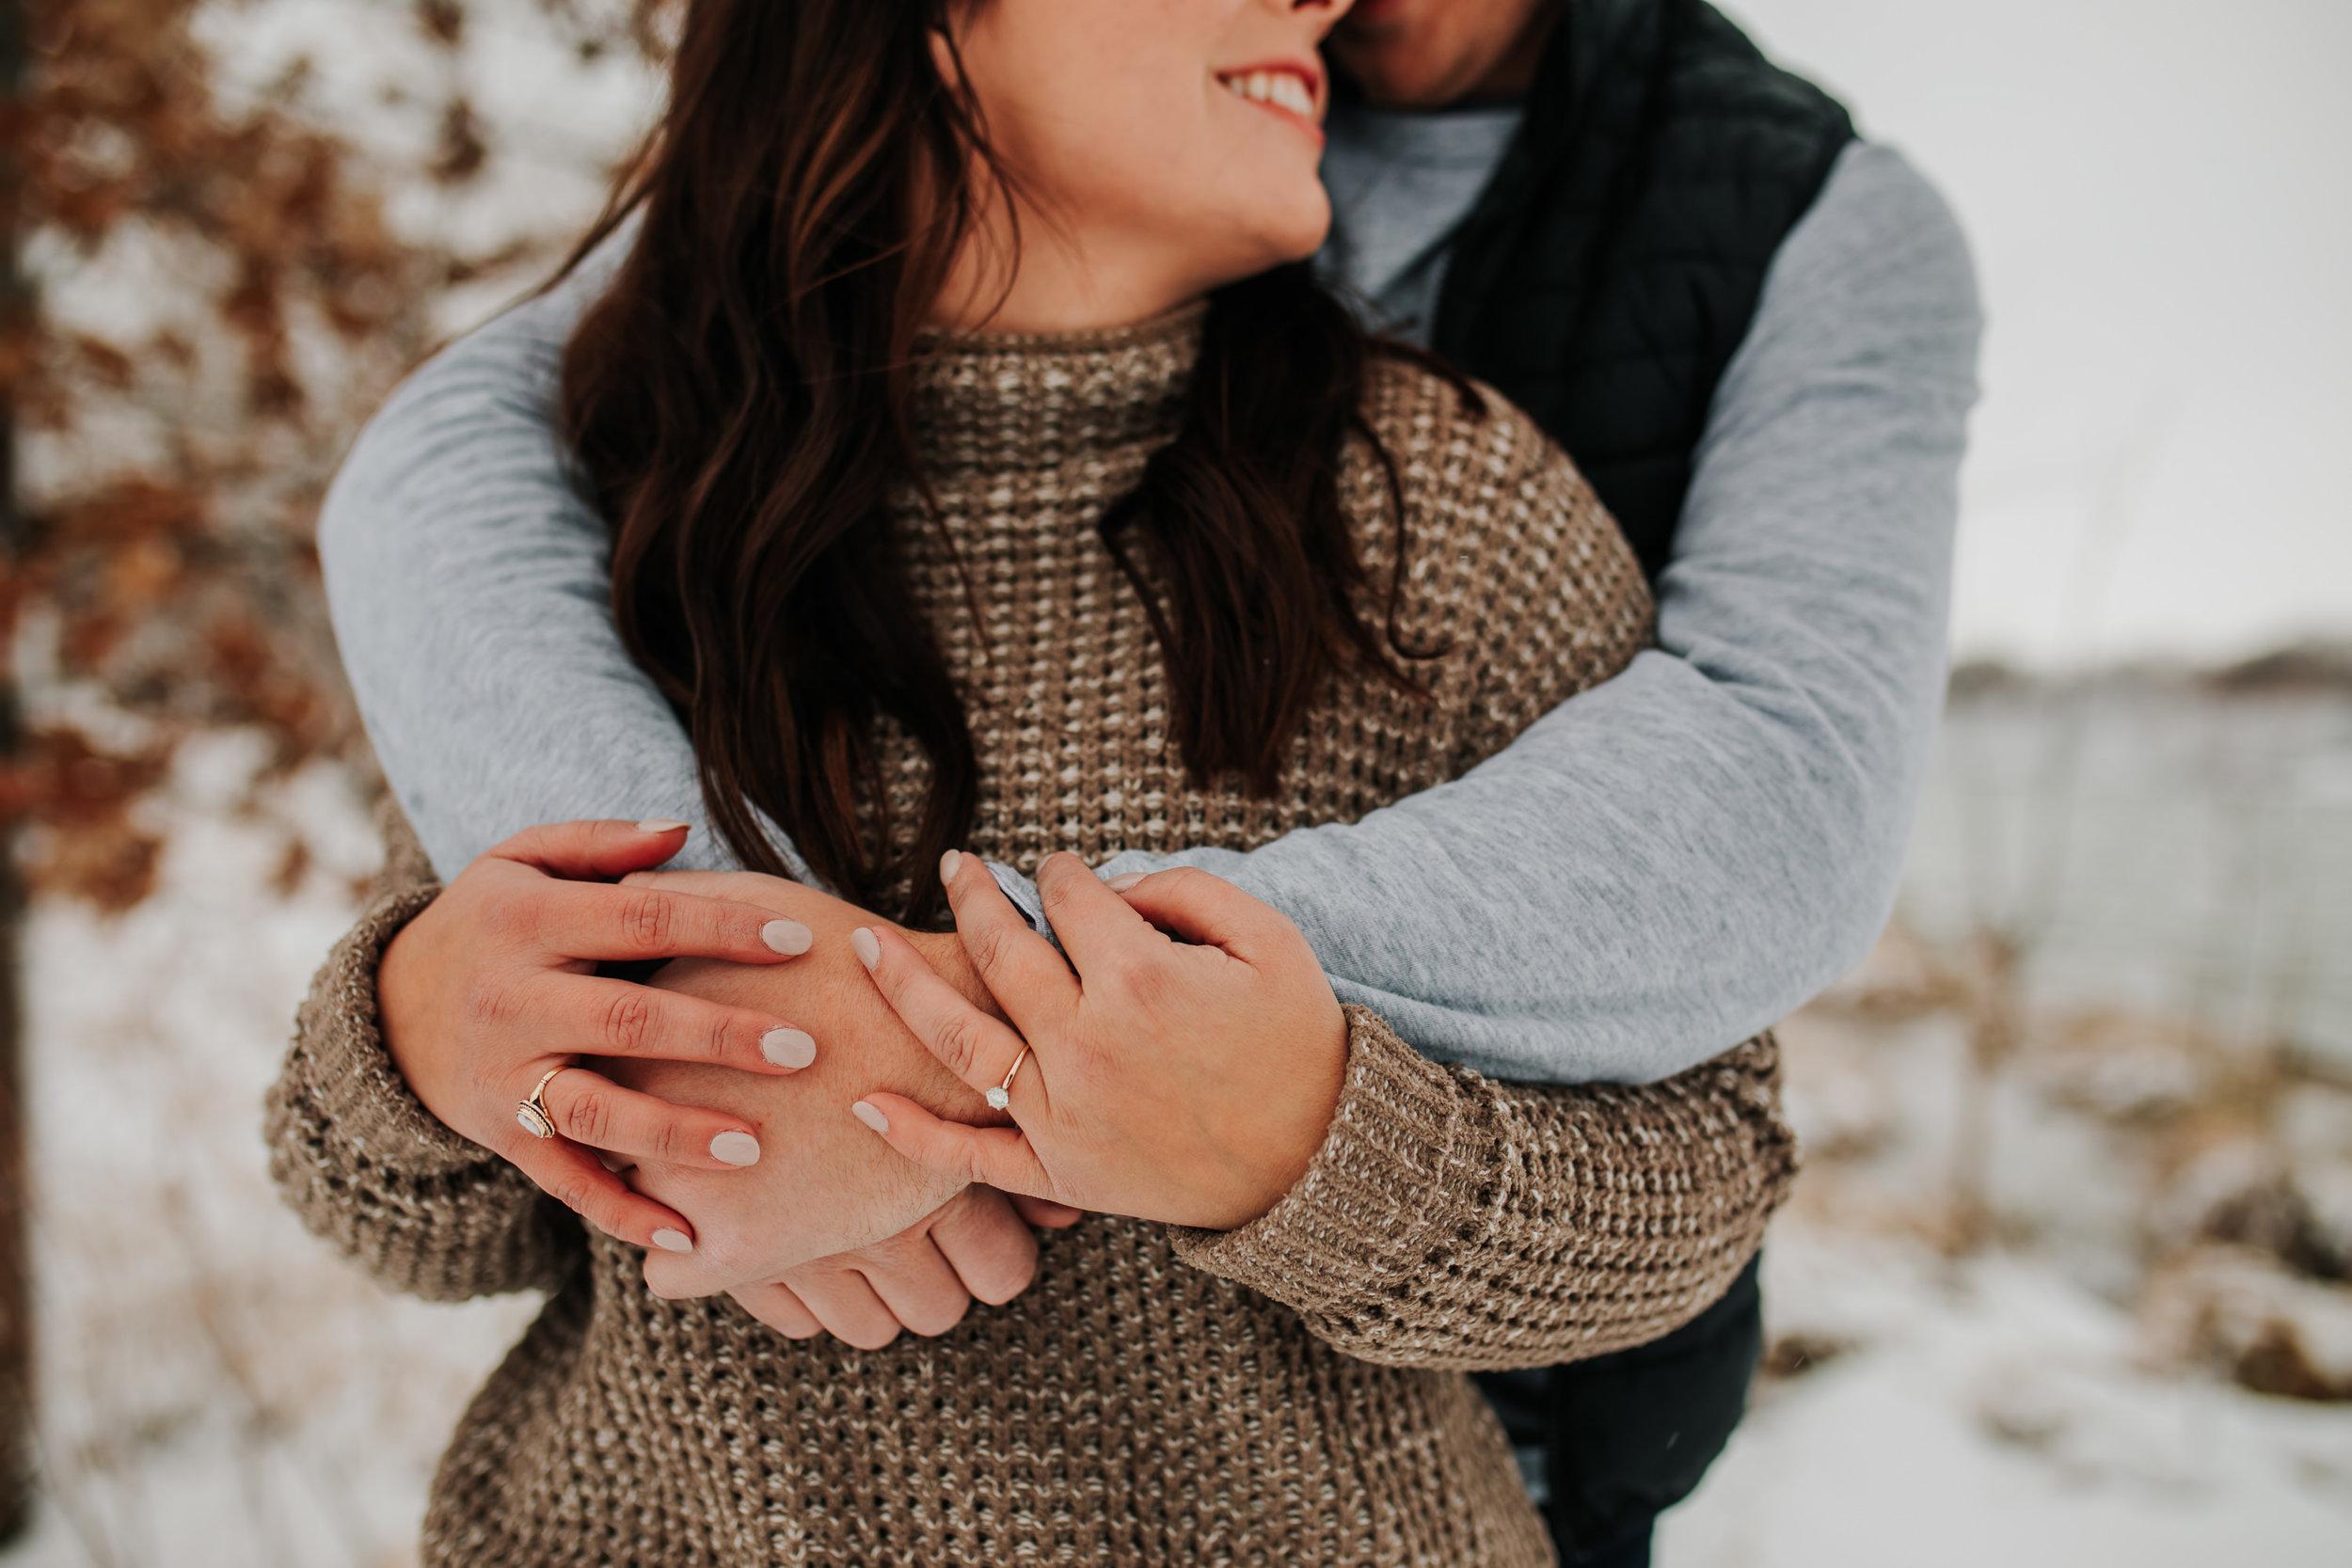 Vanessa & Dan - Engaged - Nathaniel Jensen Photography - Omaha Nebraska Wedding Photographer - Standing Bear Lake - Snowy Engagement Session-6.jpg